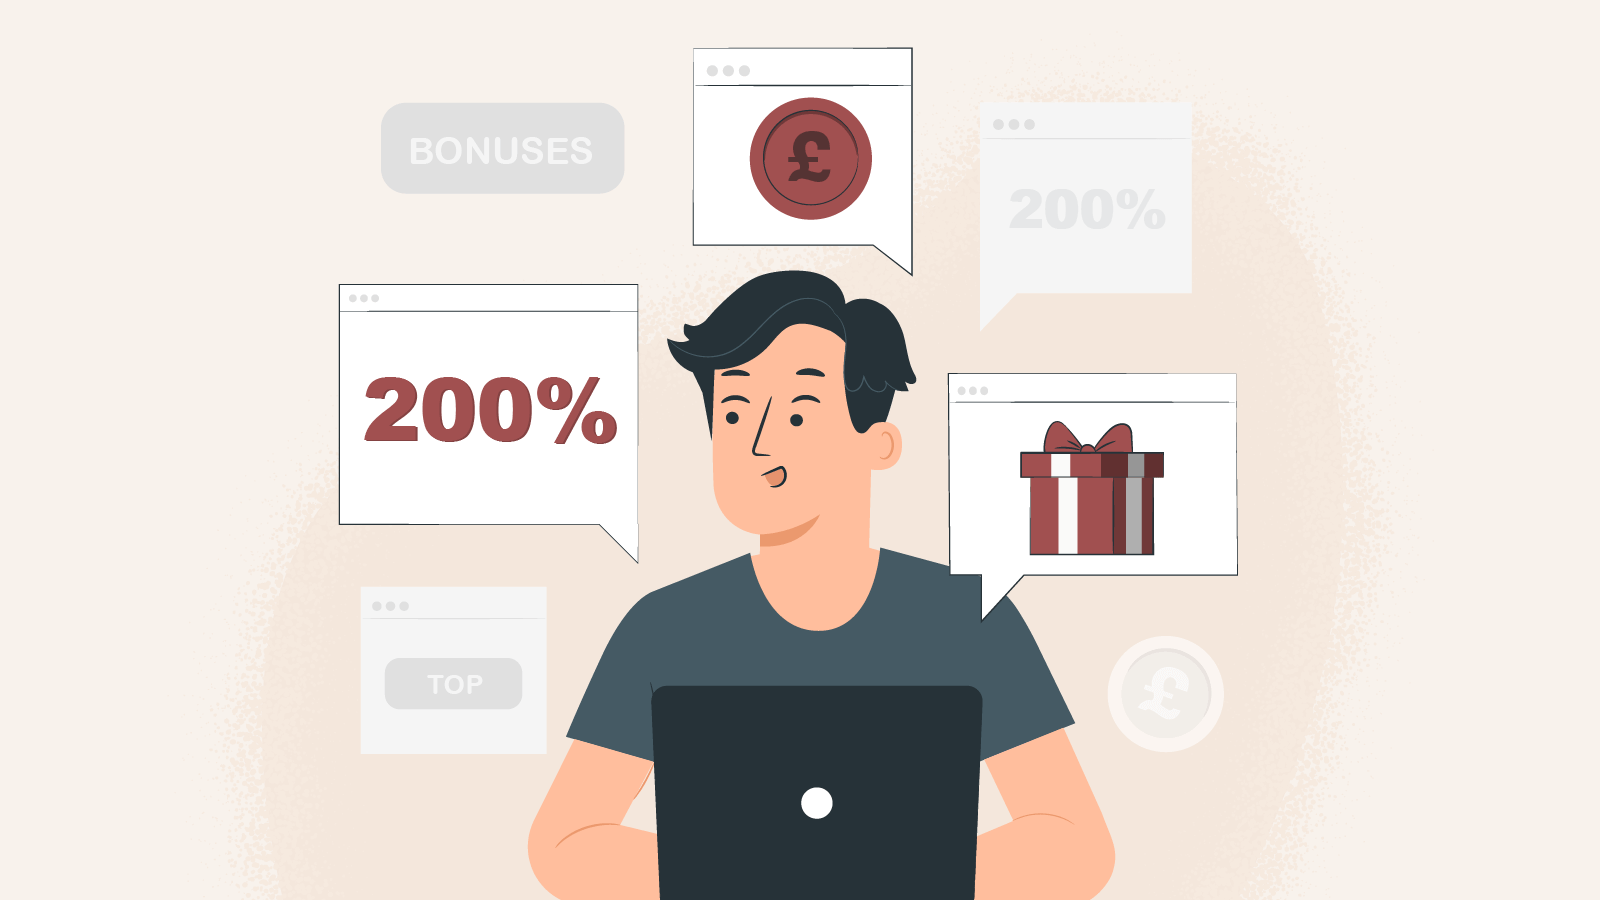 UK's top-class 200% casino bonusES